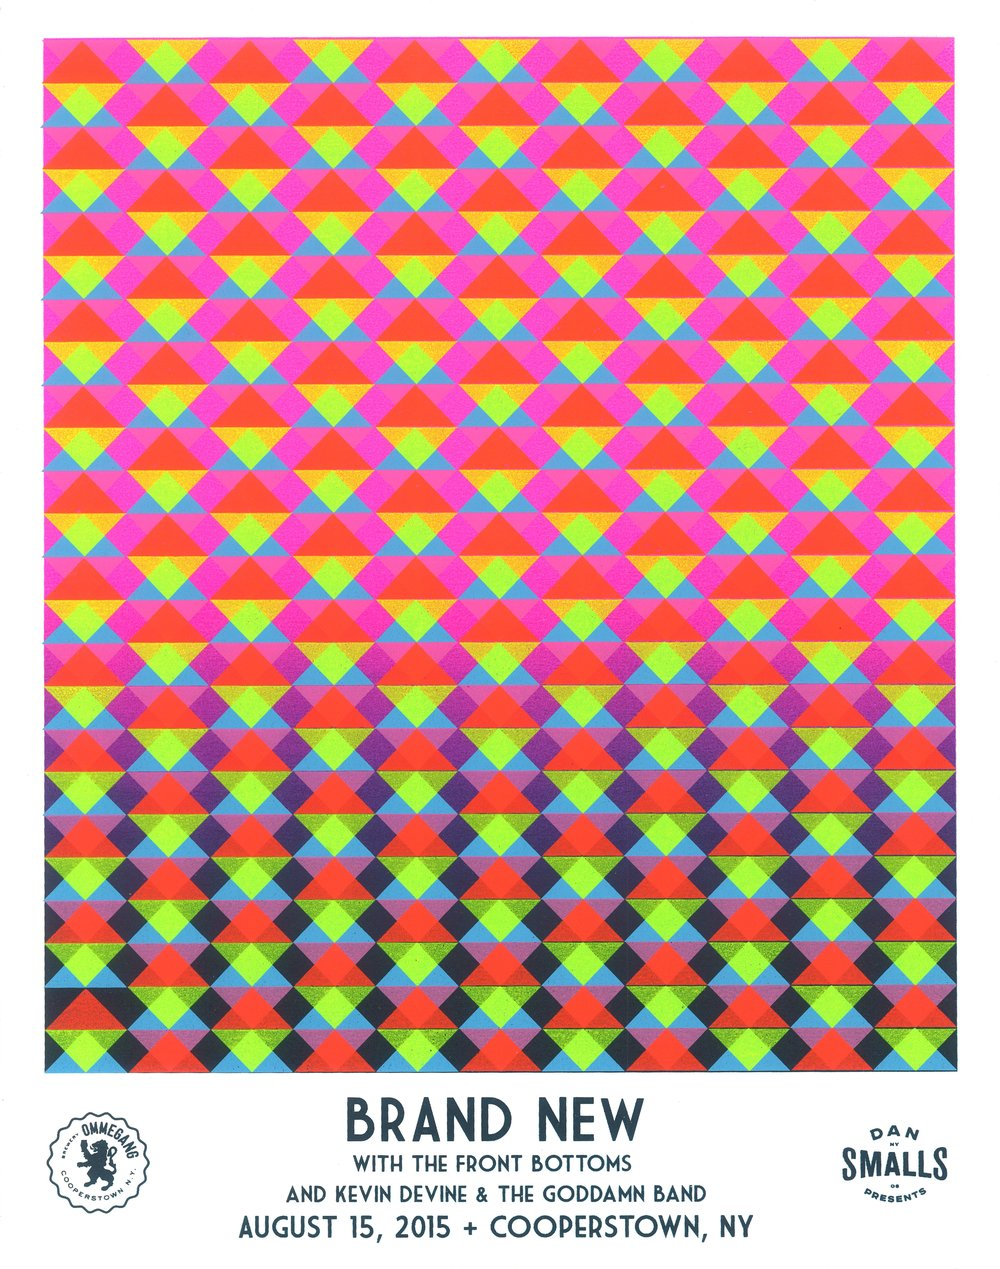 BrandNewBlue.jpg